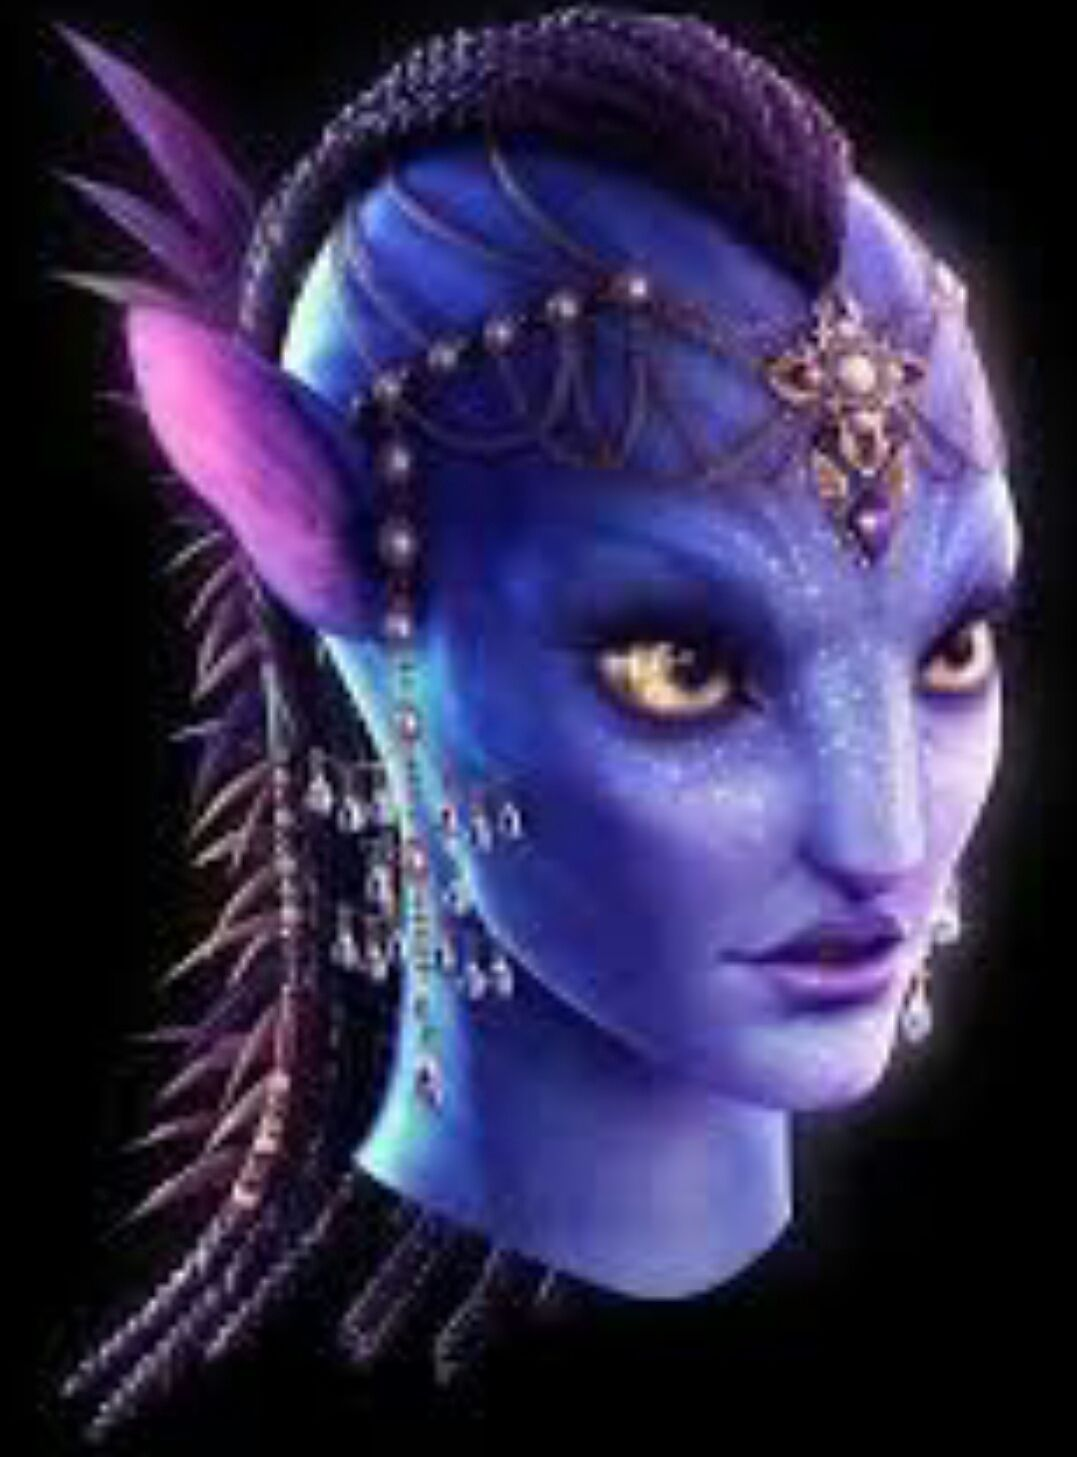 Avatar Life Of A Warrior 5 Years Later Avatar Movie Pandora Avatar Alien Avatar